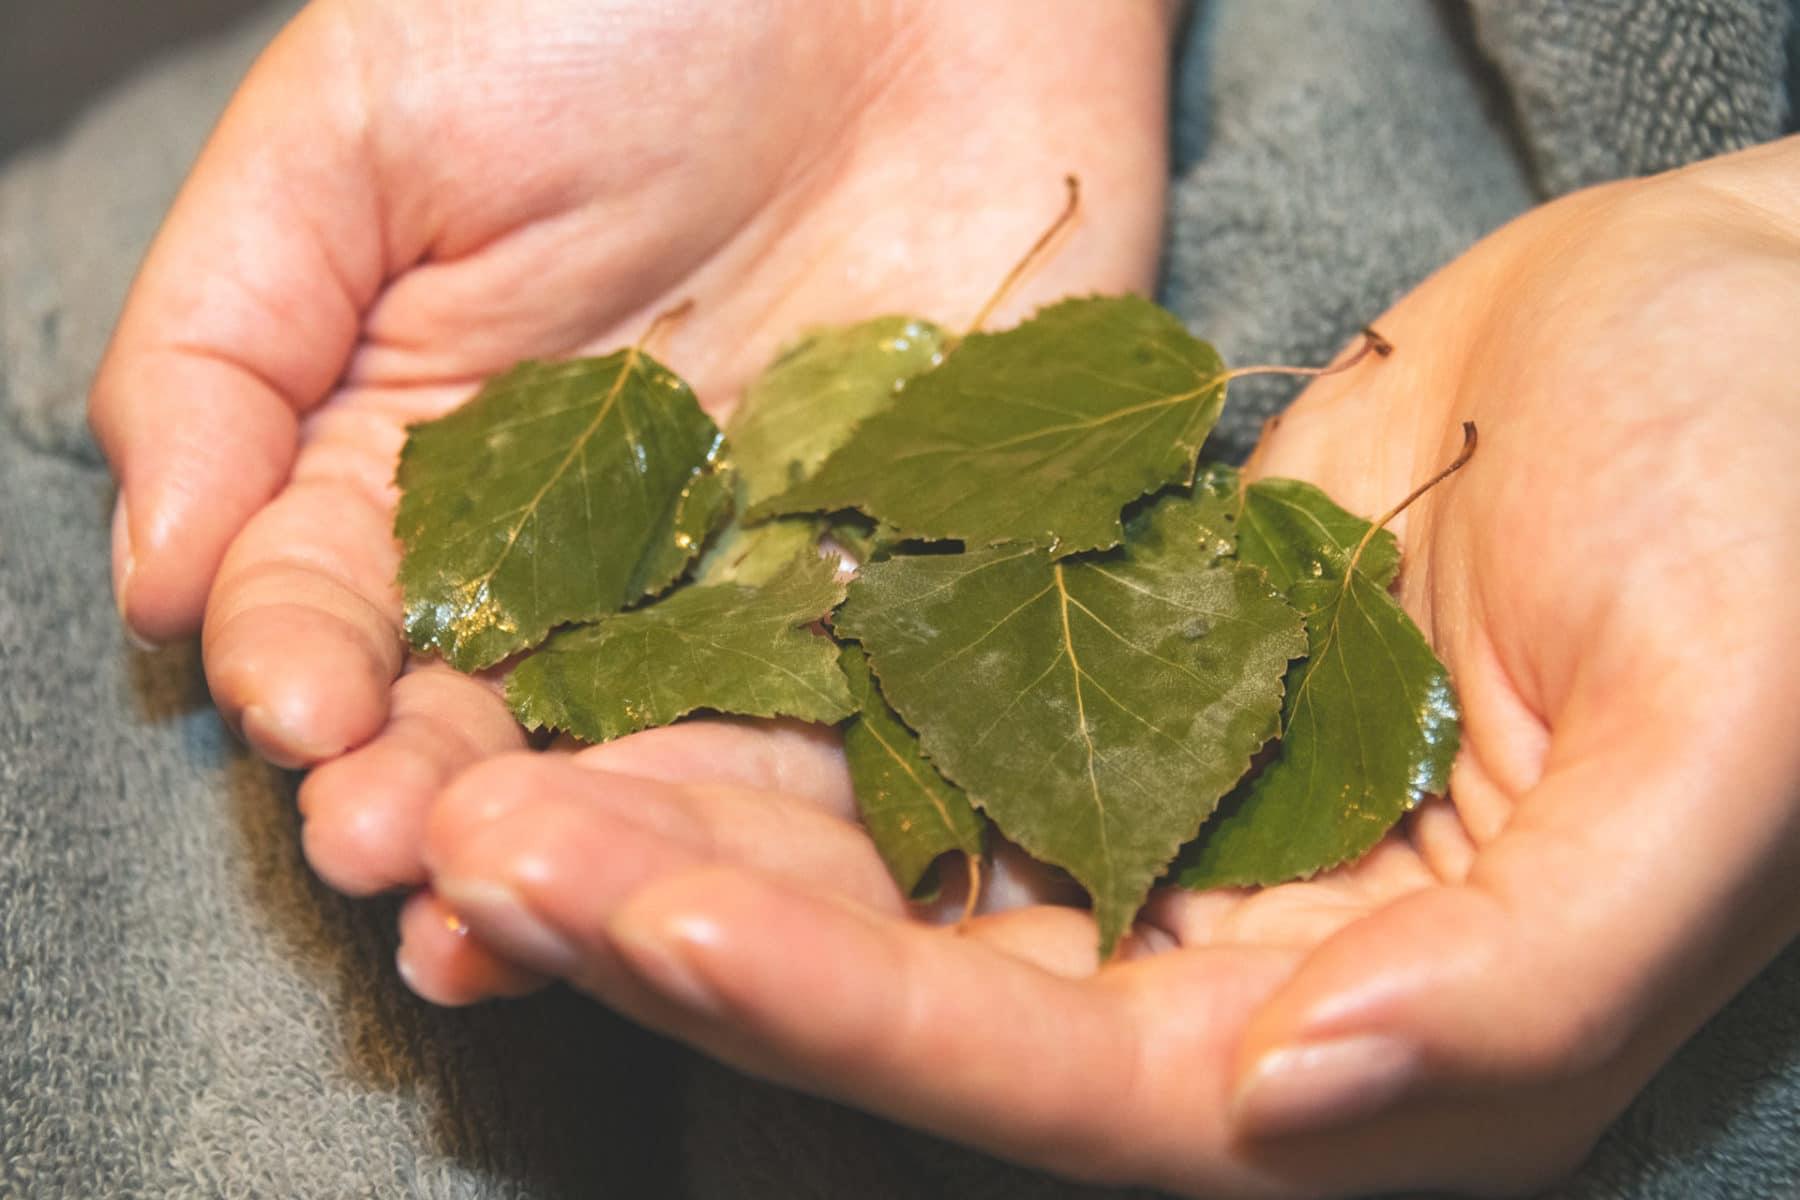 birch tree leaves on hand